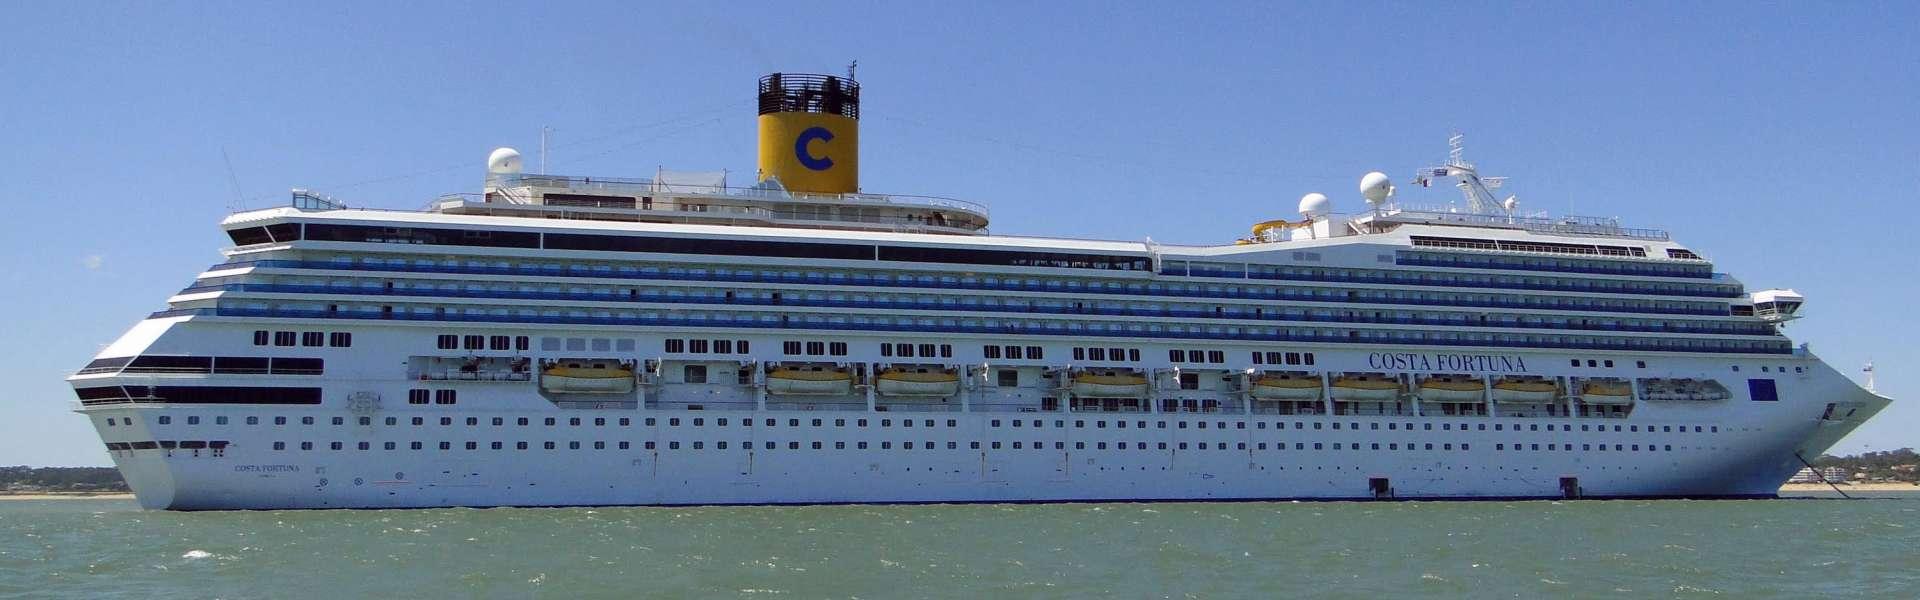 Croaziera 2018 - Asia de Sud (Singapore) - Costa Cruises - Costa Fortuna - 9 nopti